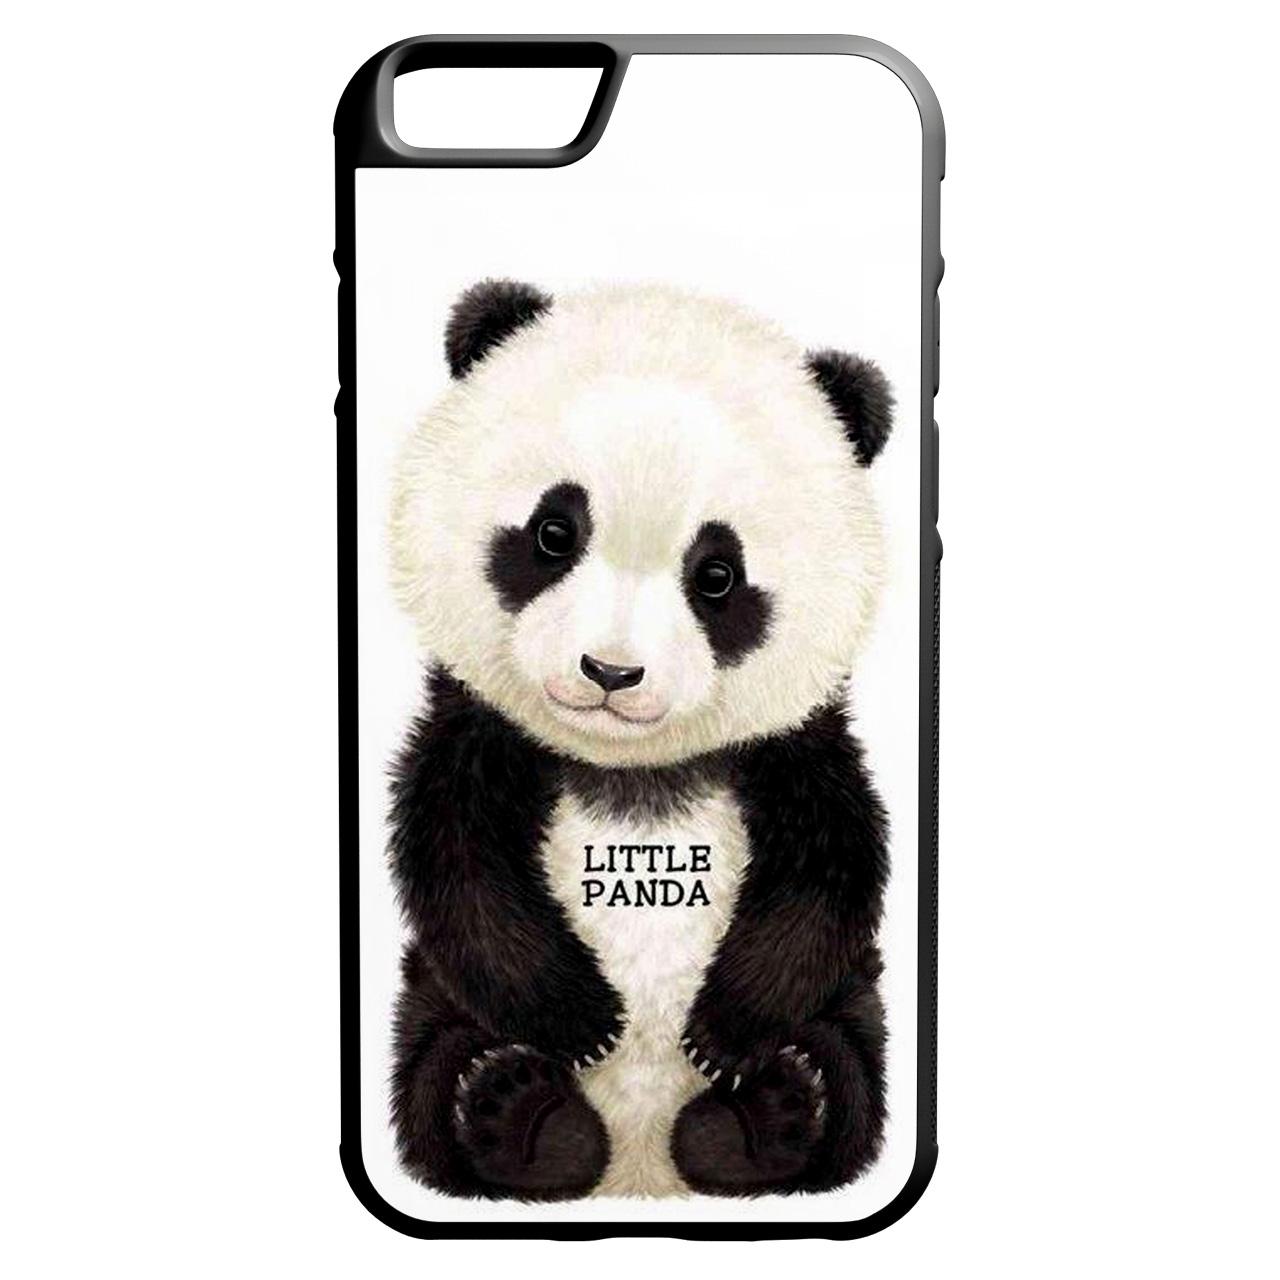 کاور طرح پاندا مدل 0366 مناسب برای گوشی موبایل اپل iphone 6/6s